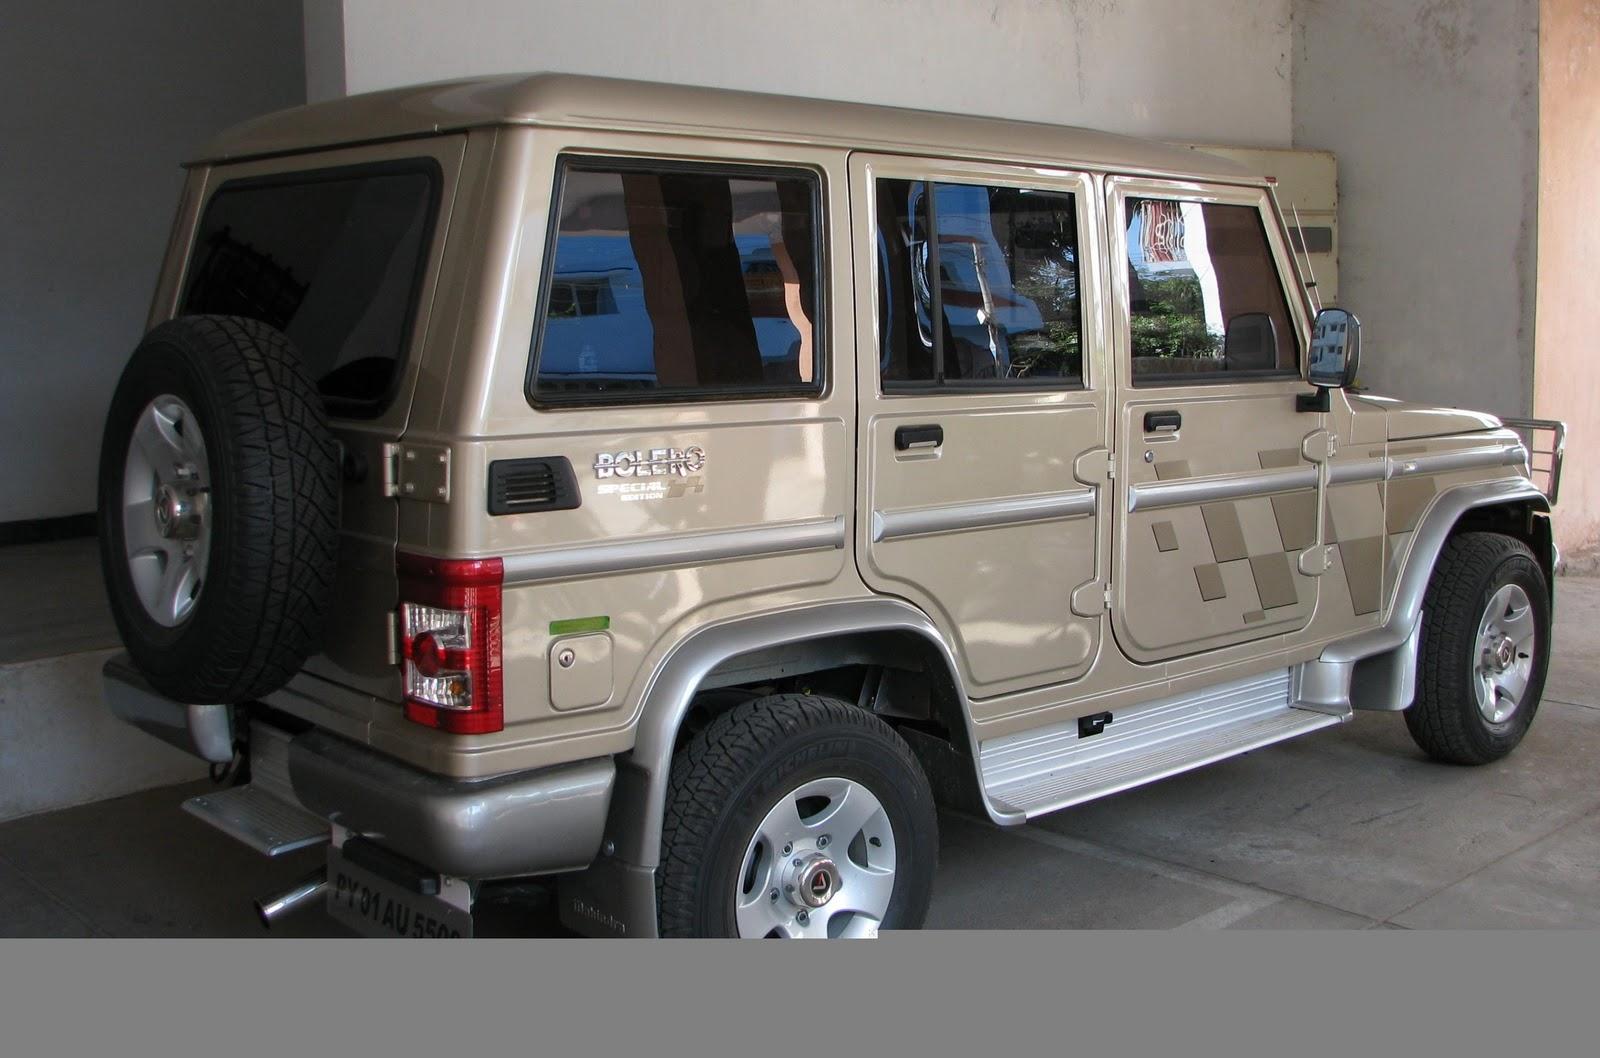 4bpblogspot 11qbWSsbfFM TZ2HzKMLQmI Mahindra Launches Bolero Special Edition Car Dunia